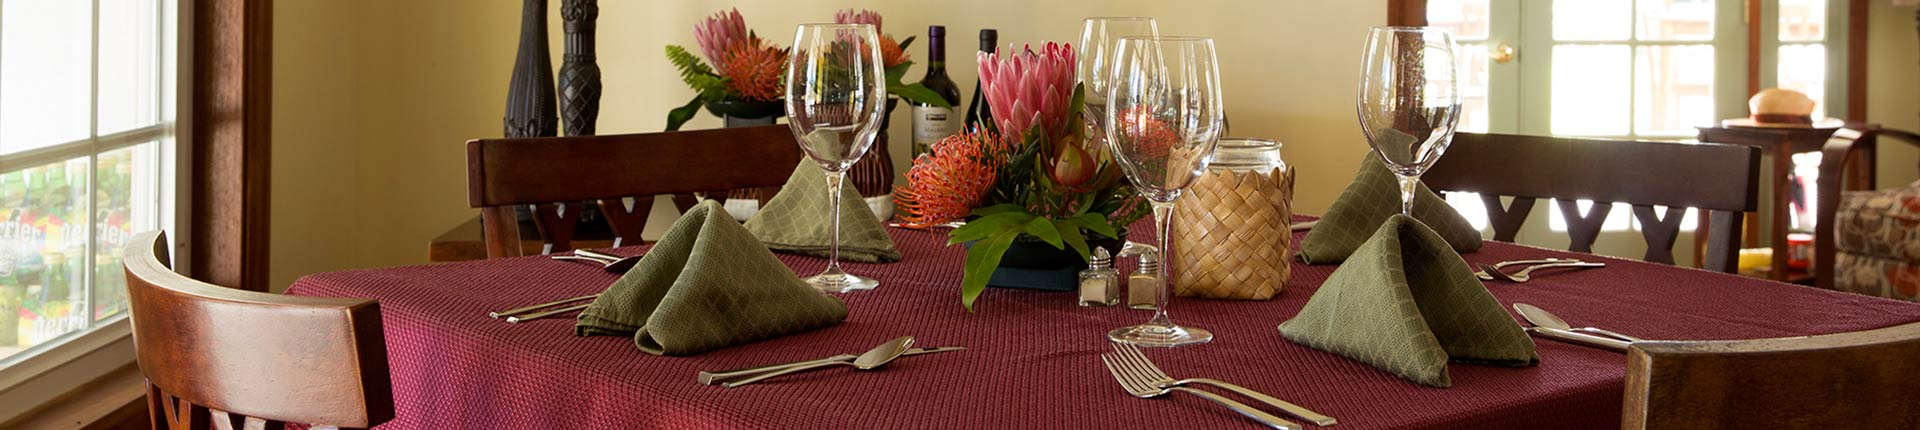 Dining table at Kalaekilohana Inn & Retreat Hawaii